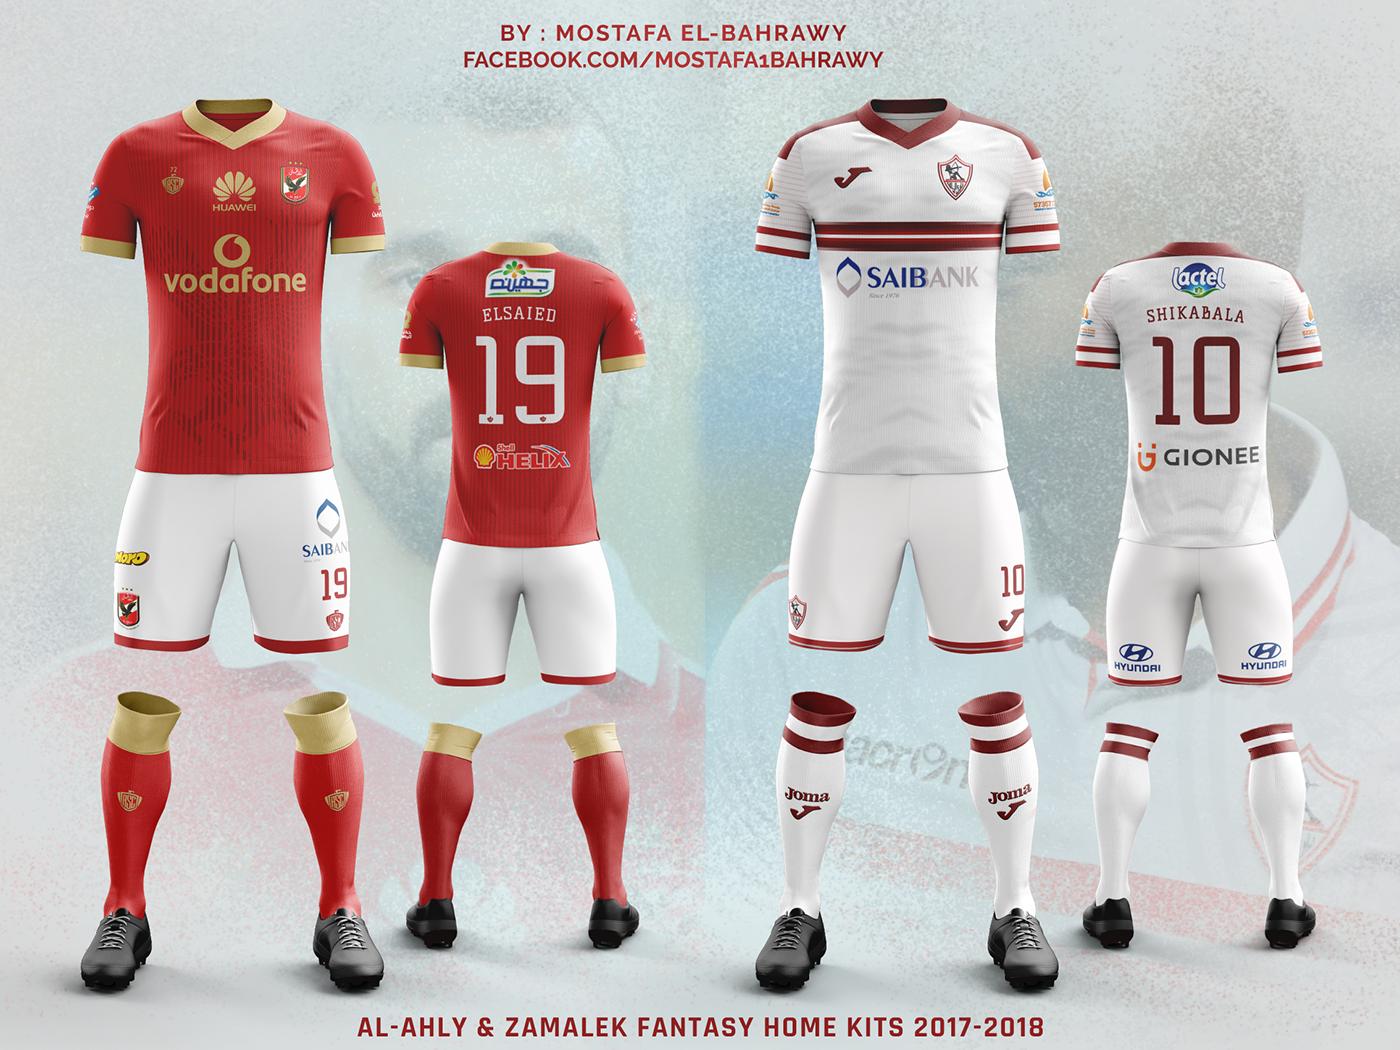 Al-Ahly & Zamalek Fantasy Home Kits 2017-2018 On Behance